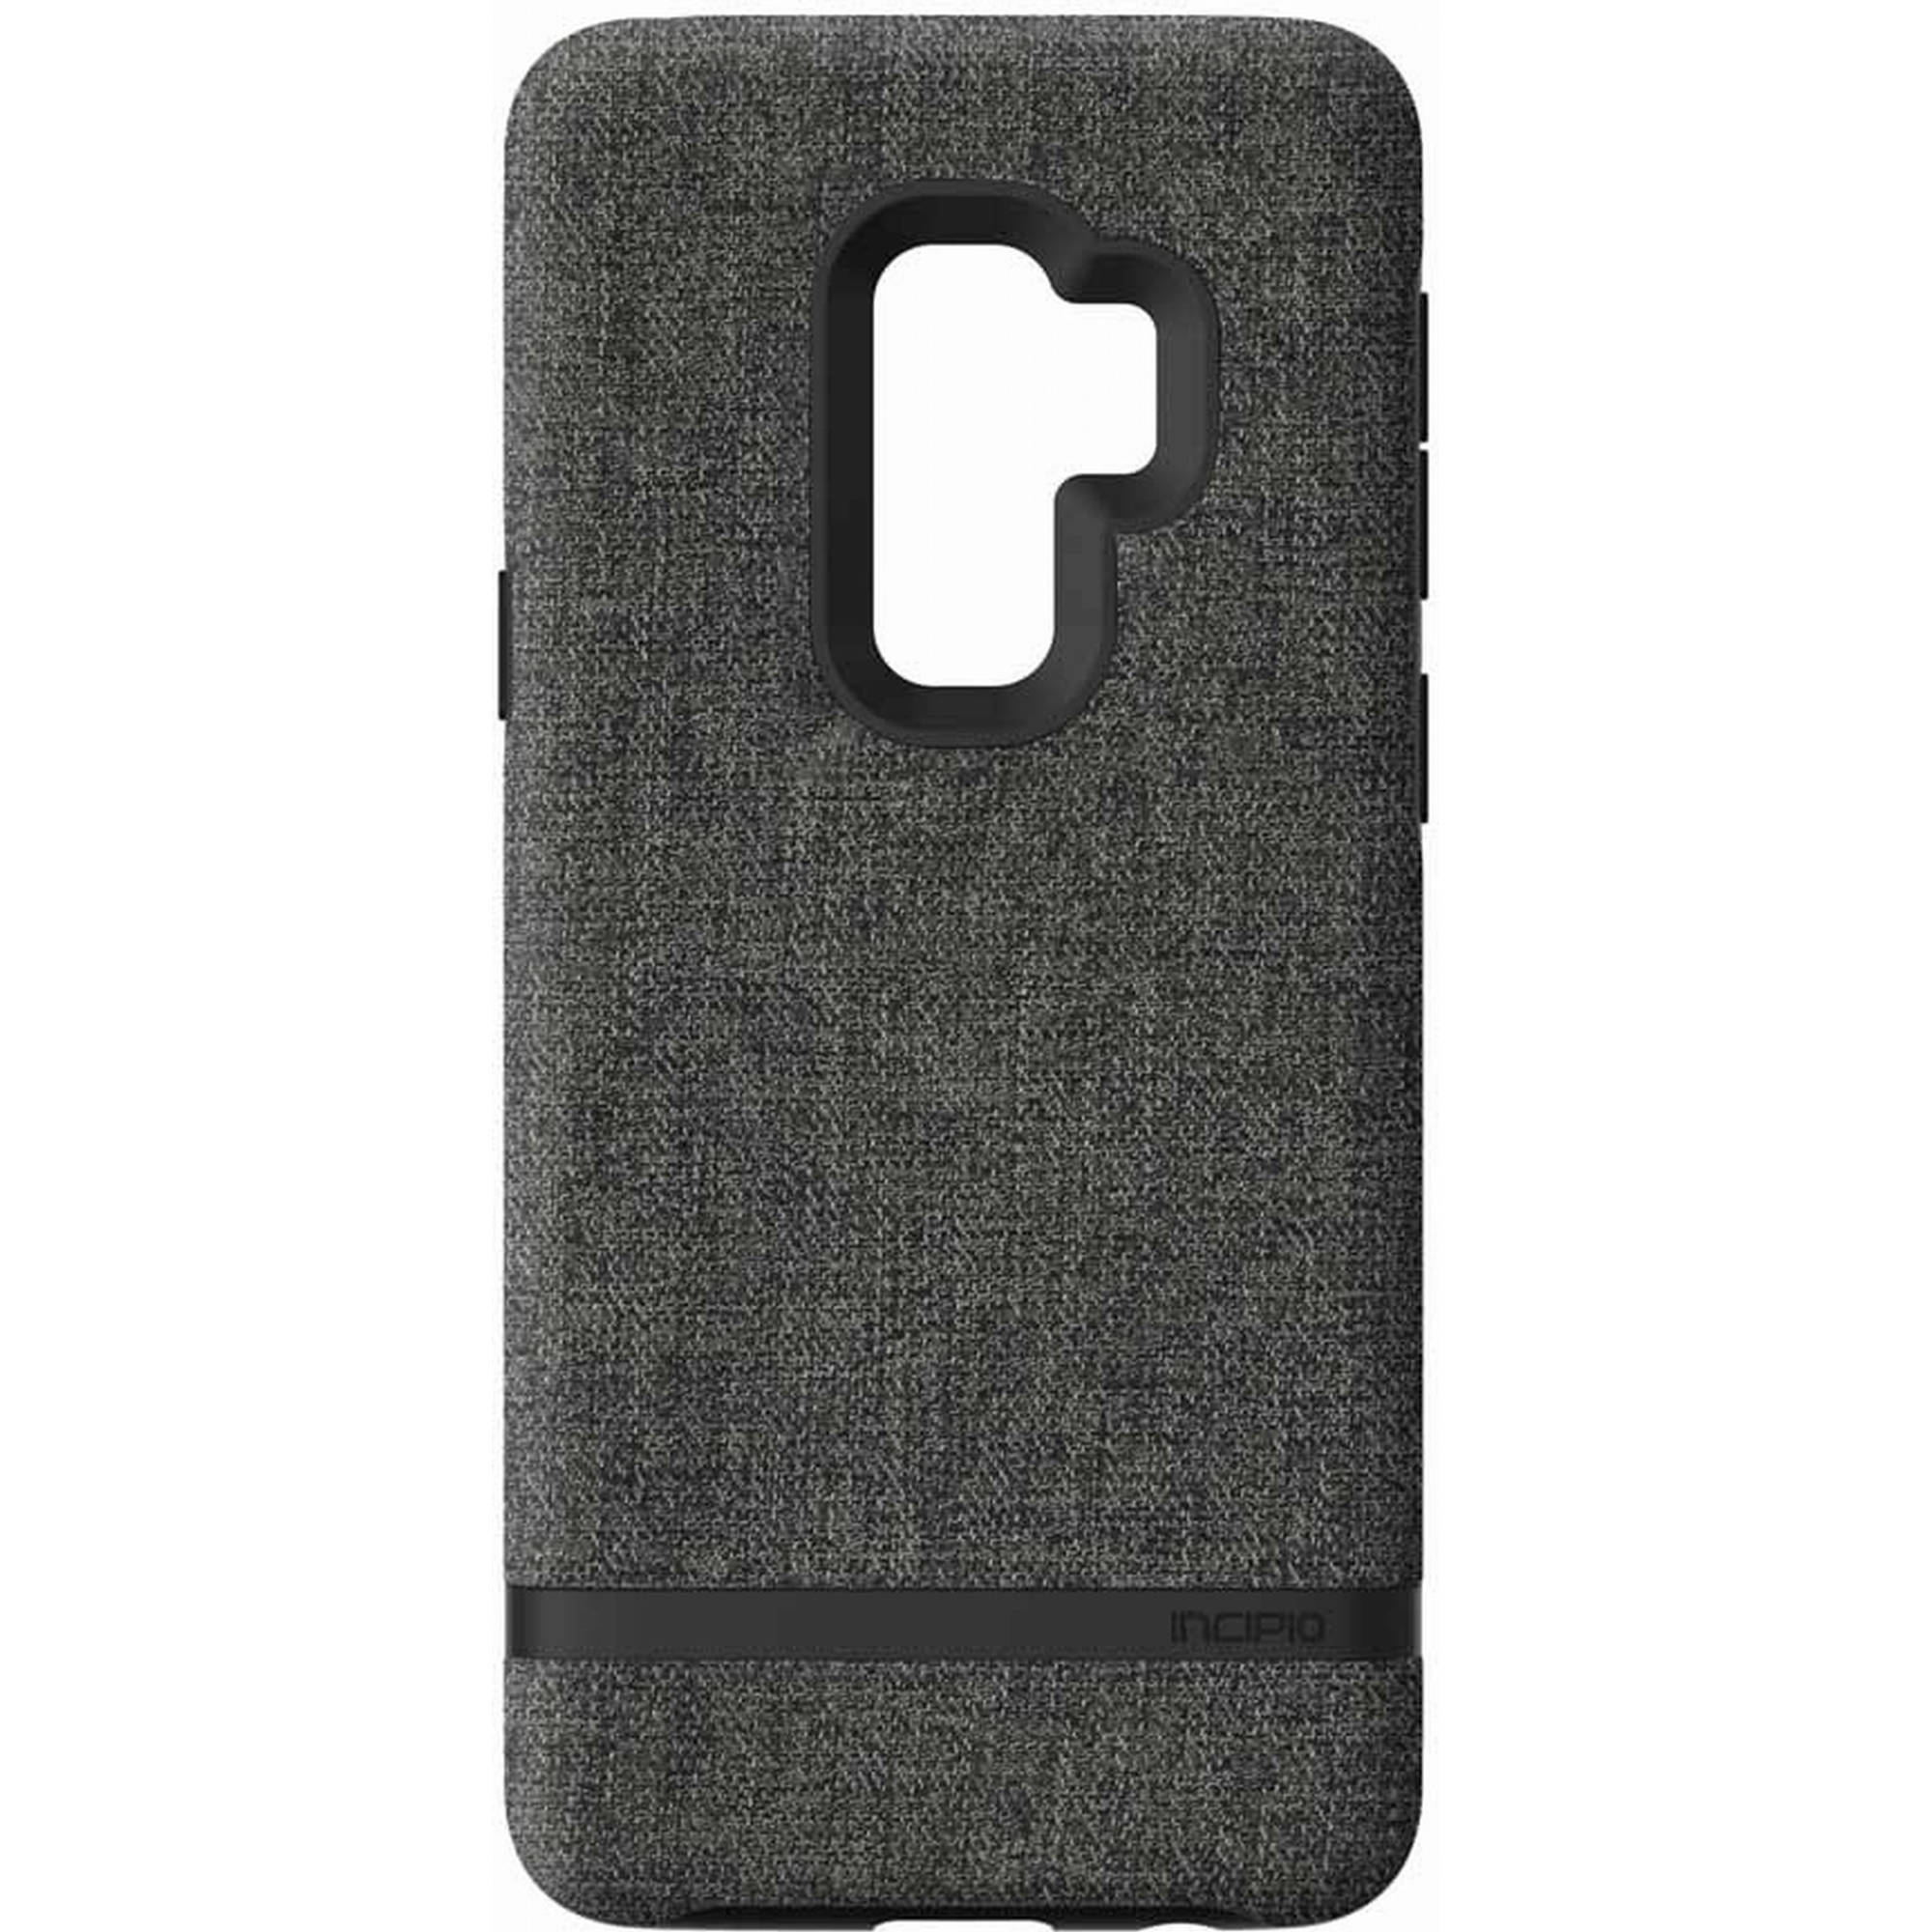 sale retailer 56e8f cc3cf Incipio Esquire Series Carnaby Case for the Samsung Galaxy S9+ (Gray)